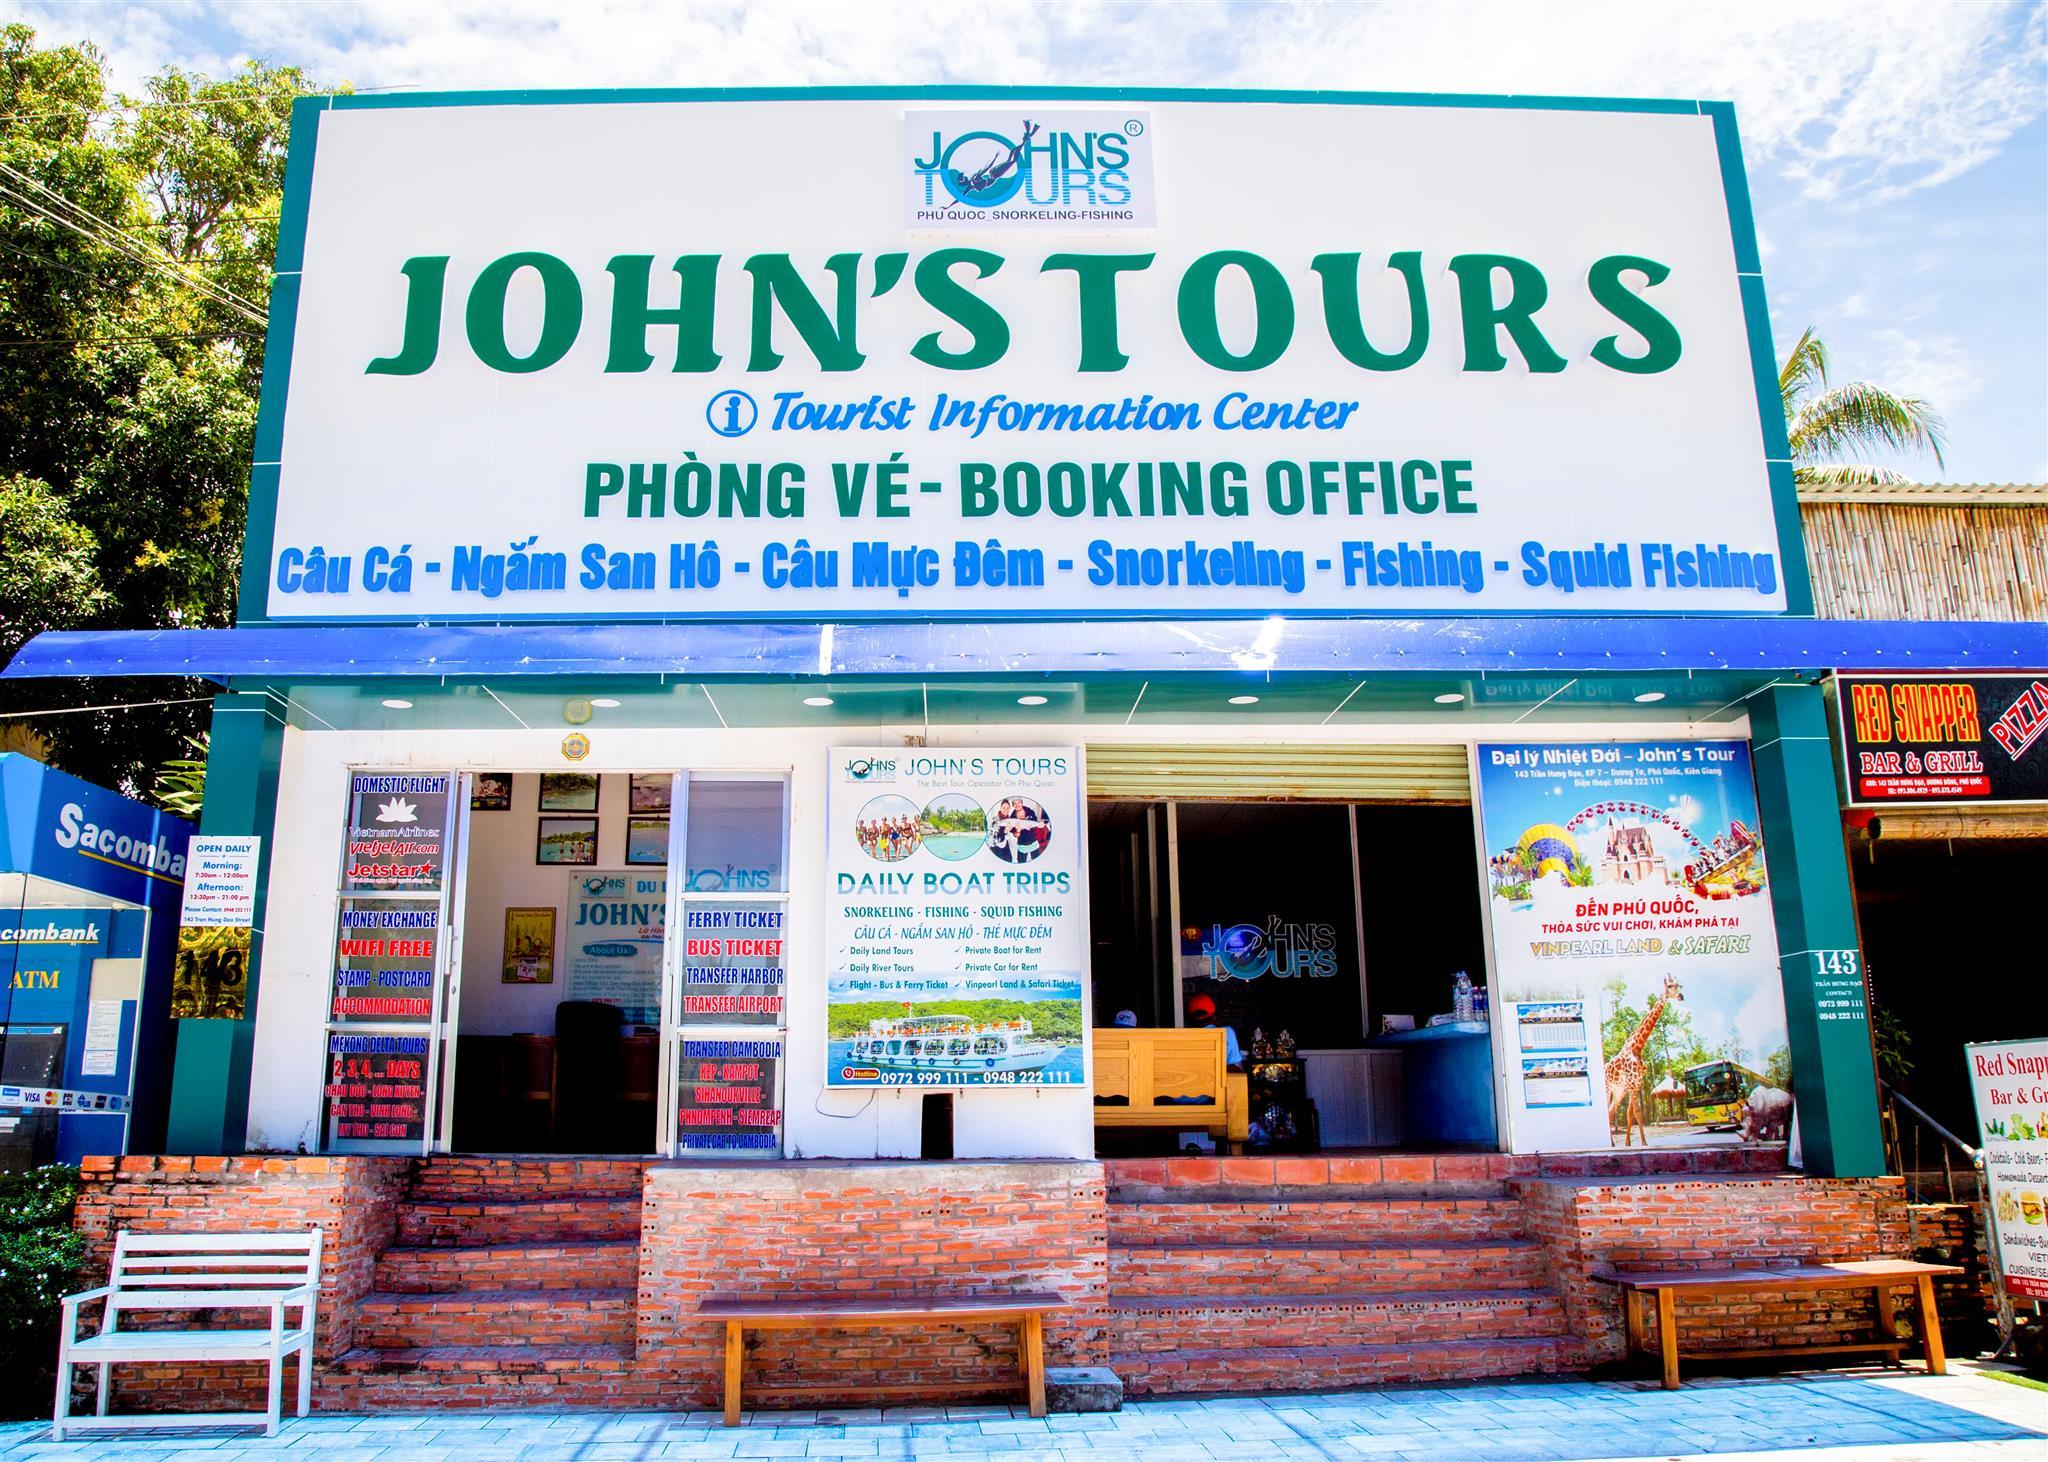 Giới thiệu về John's Tours